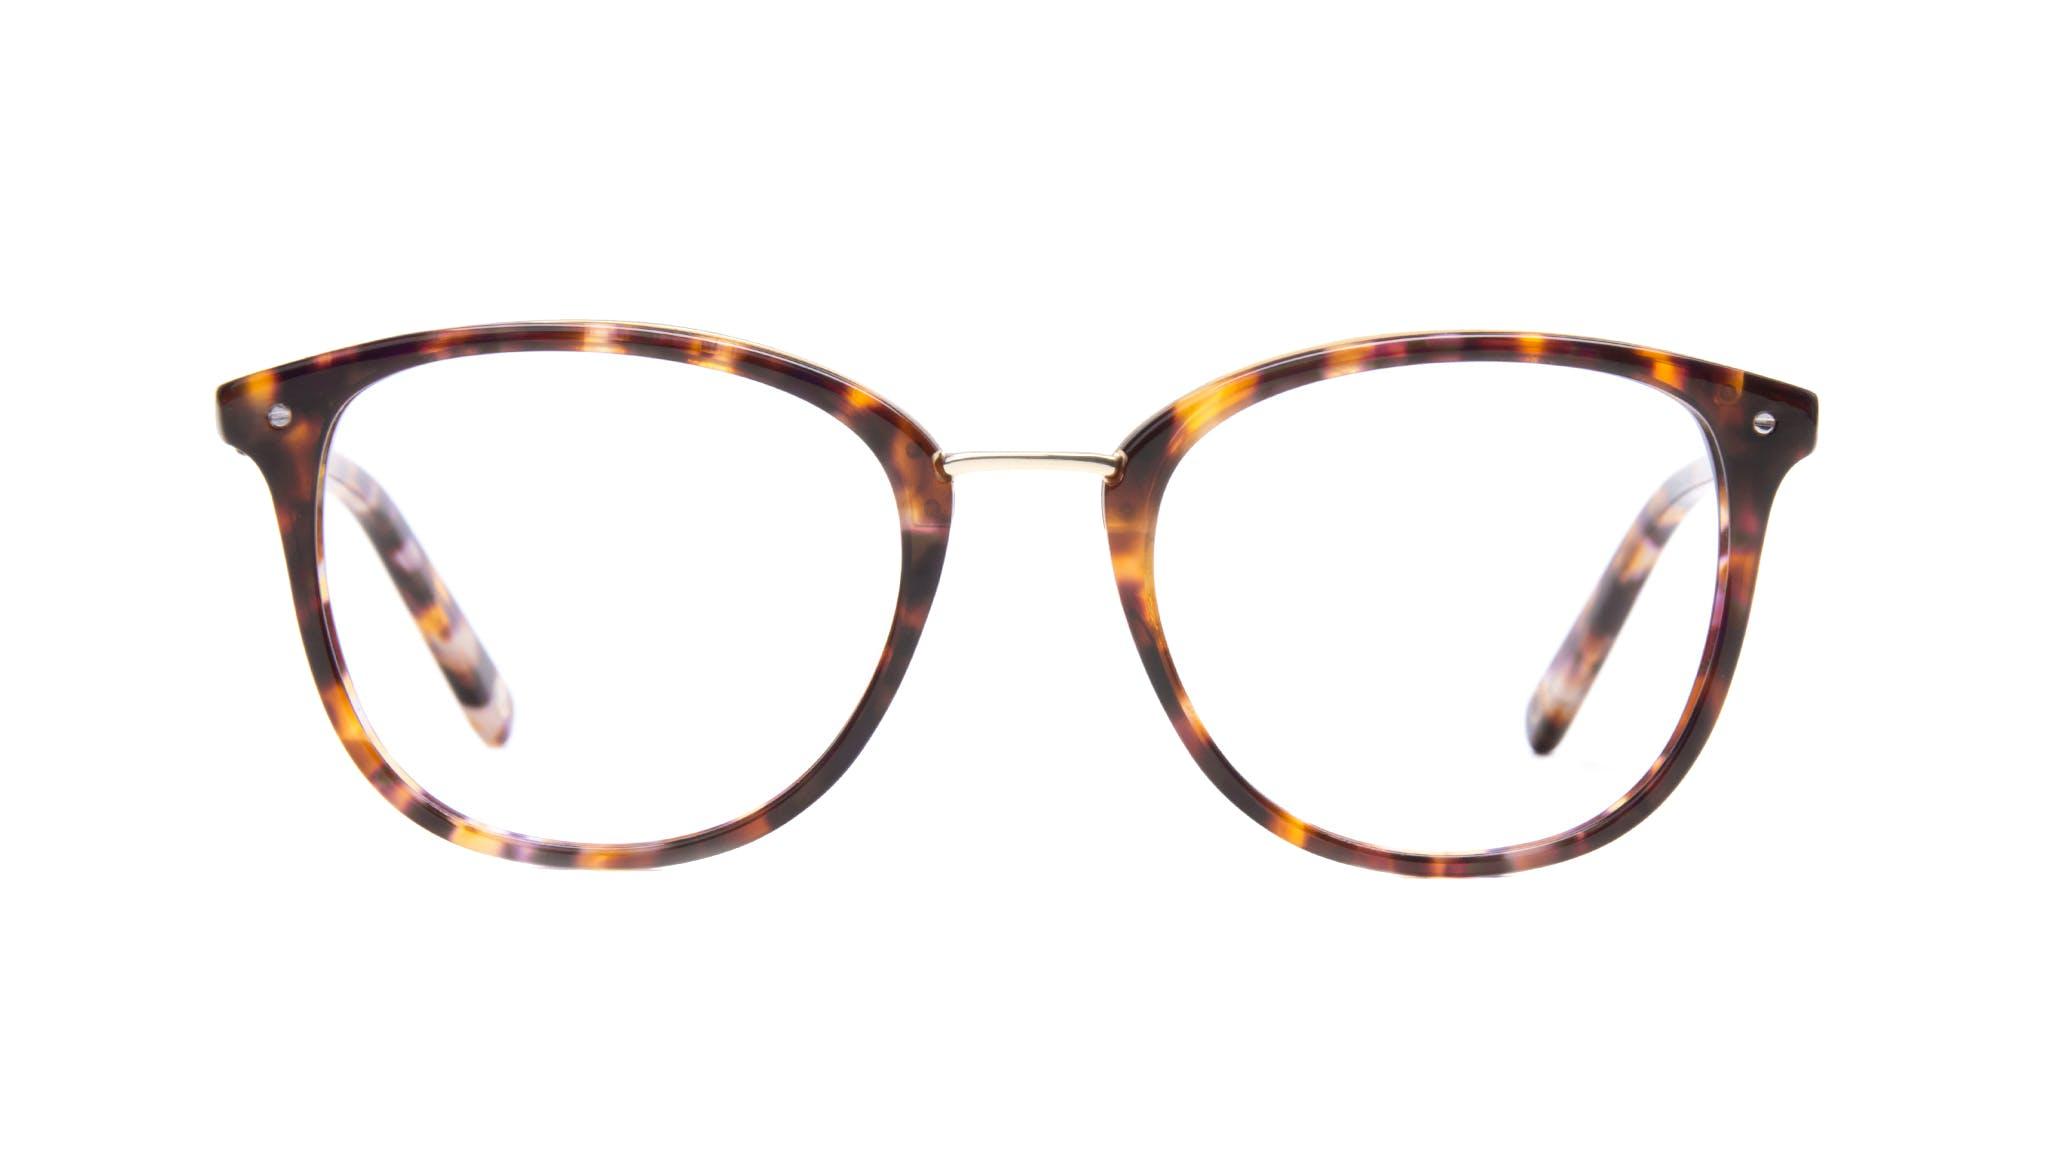 Affordable Fashion Glasses Square Round Eyeglasses Women Bella Dark Tortoise Front